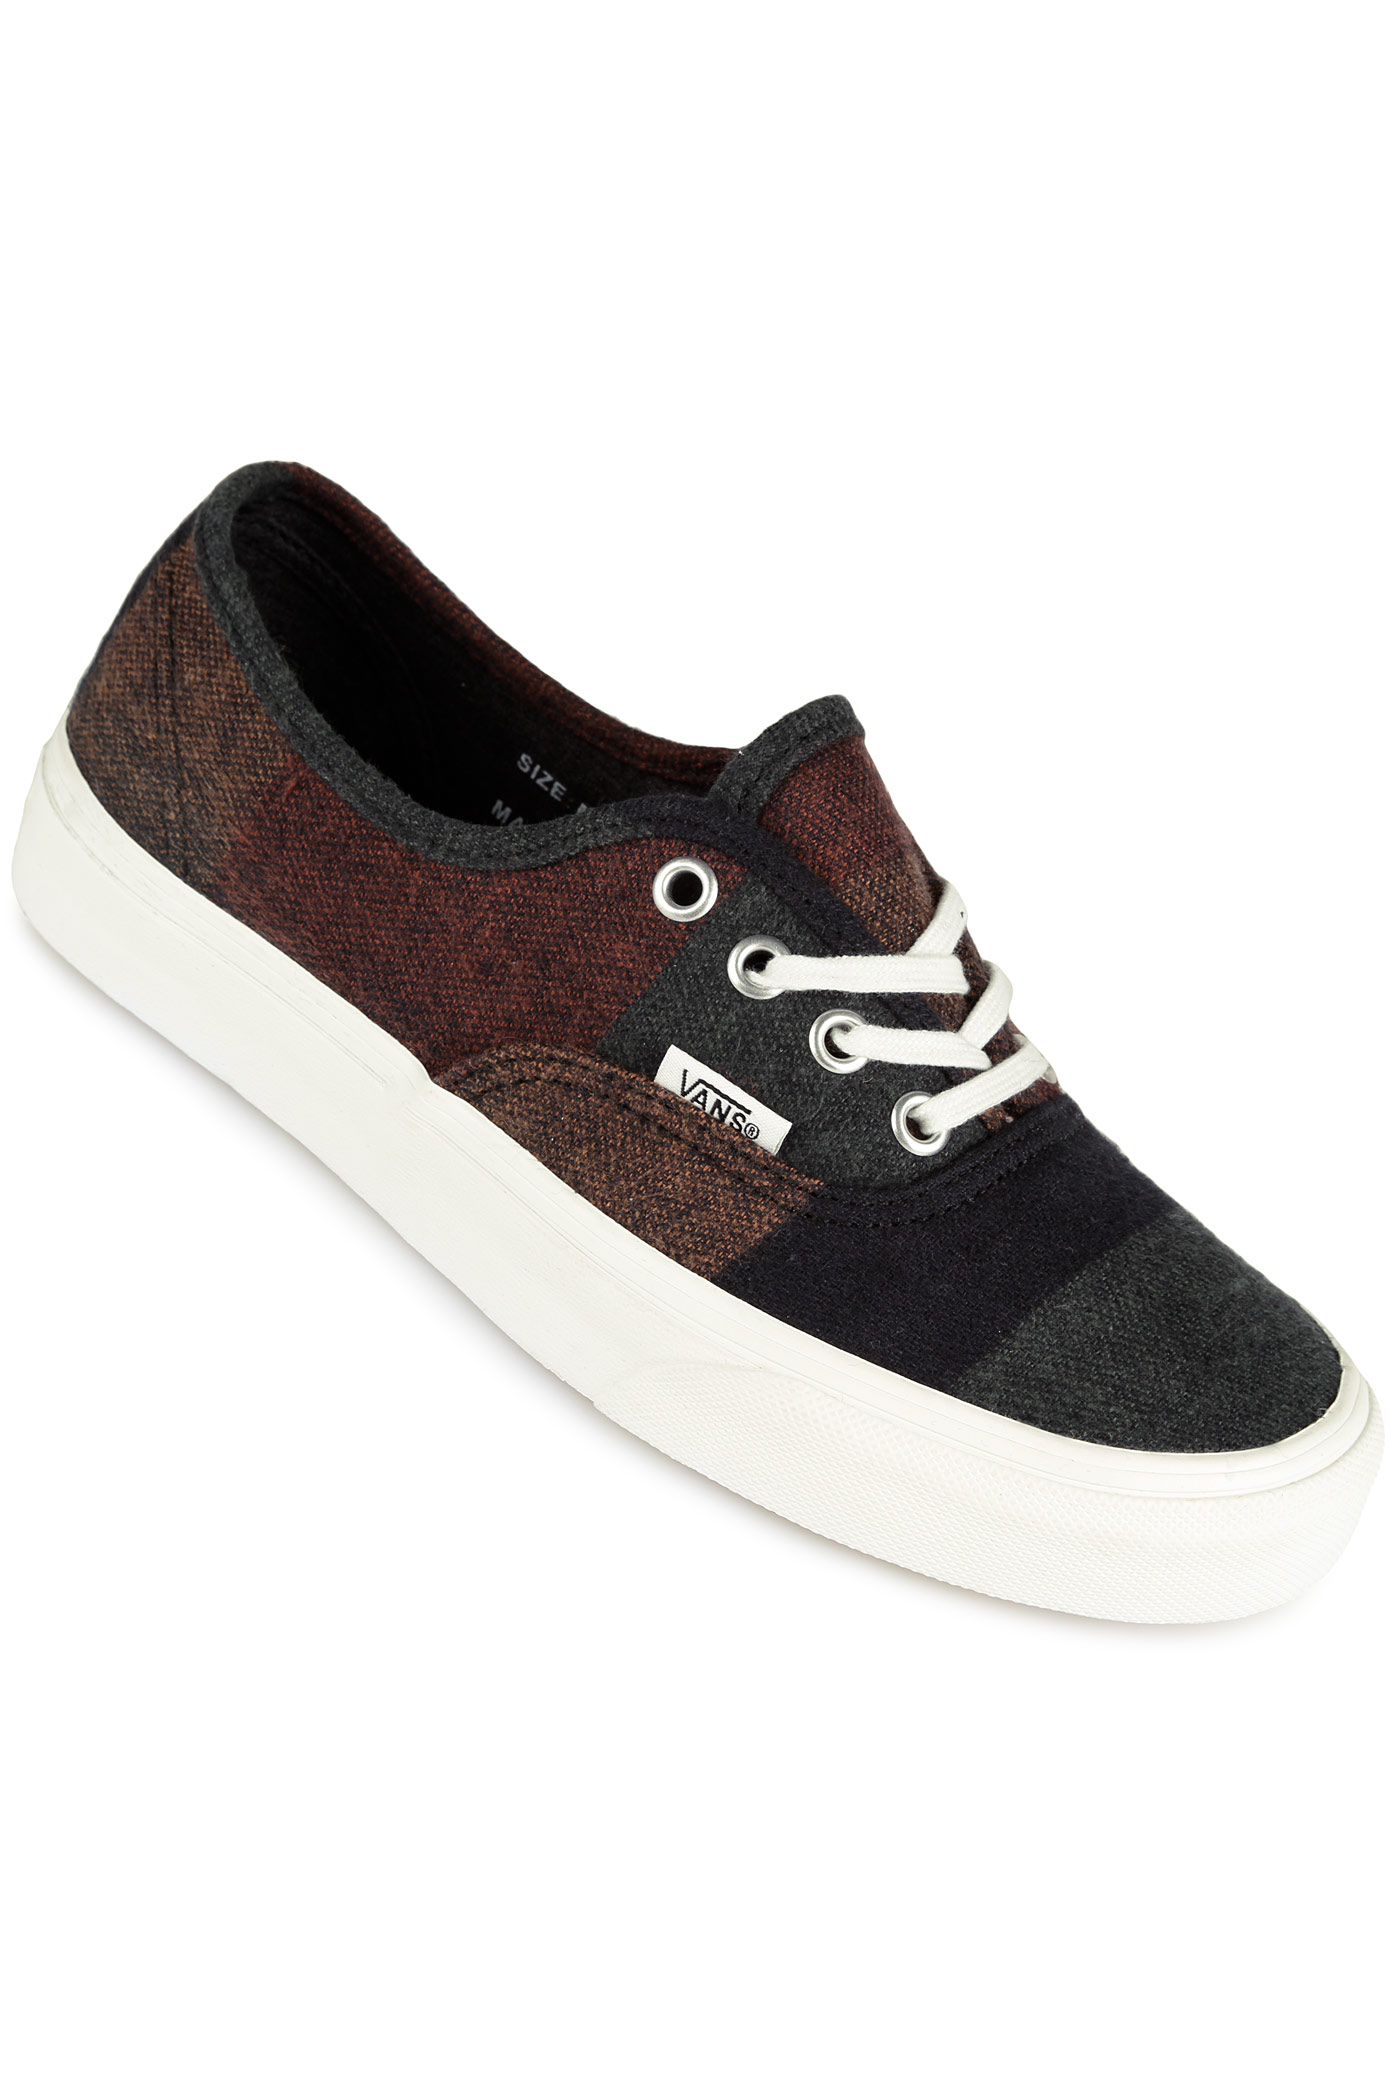 Vans Authentic Shoes women (wool stripes multi blanc) buy ...